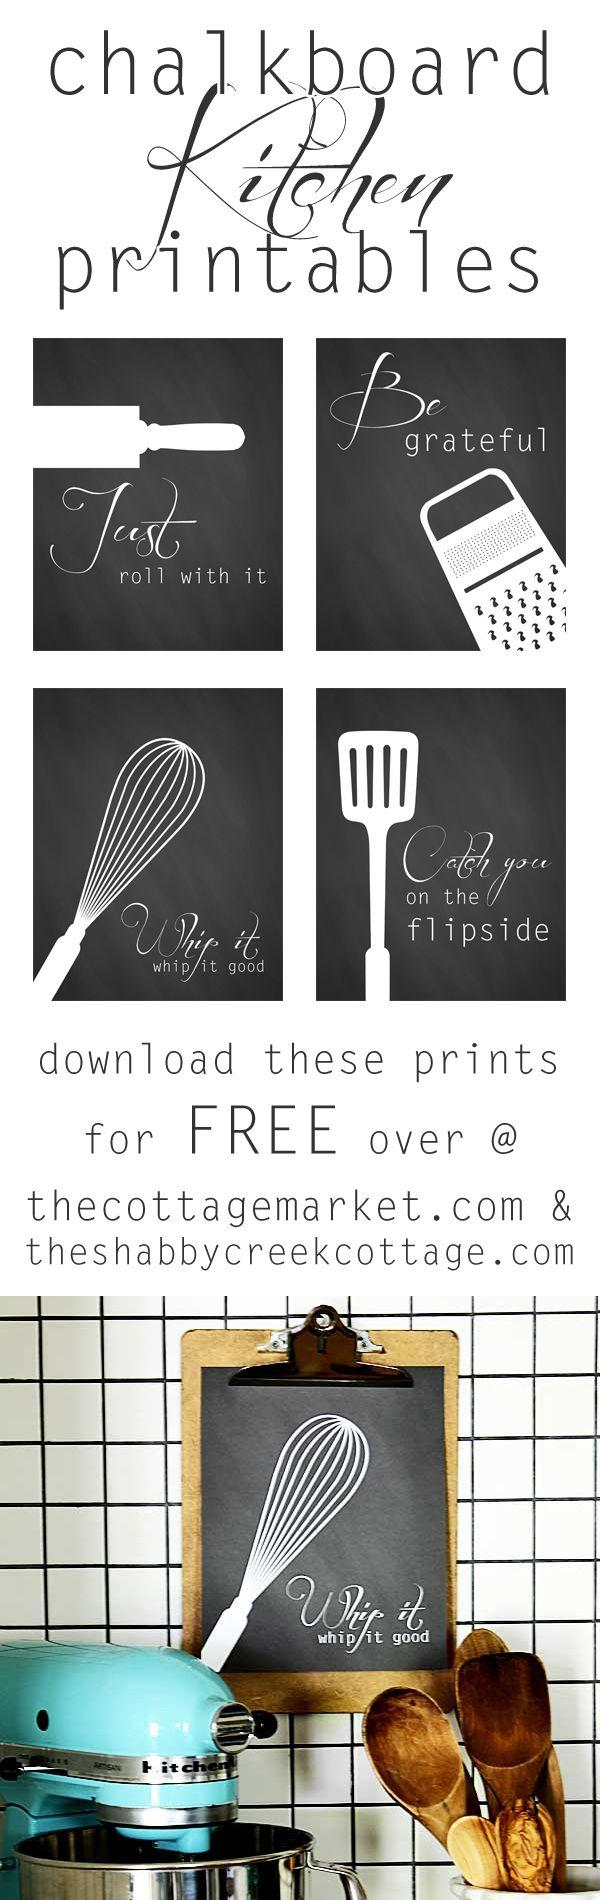 Free Kitchen Art Printables - The Cottage Market